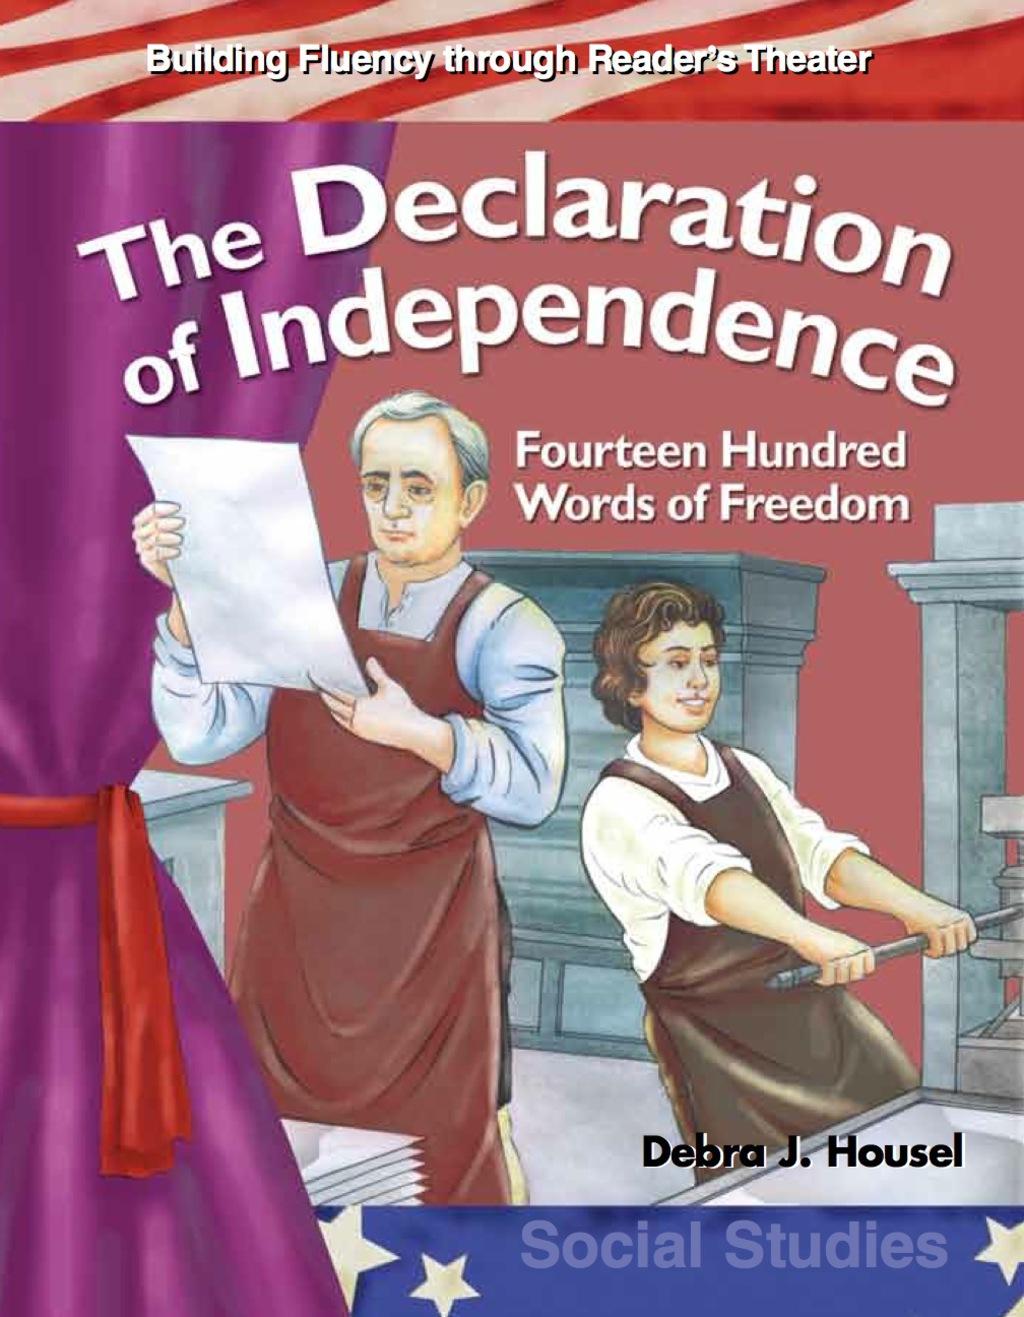 By Debra J. Housel PRINTISBN: 9781433392047 E-TEXT ISBN: 9781433392047 Edition: 1